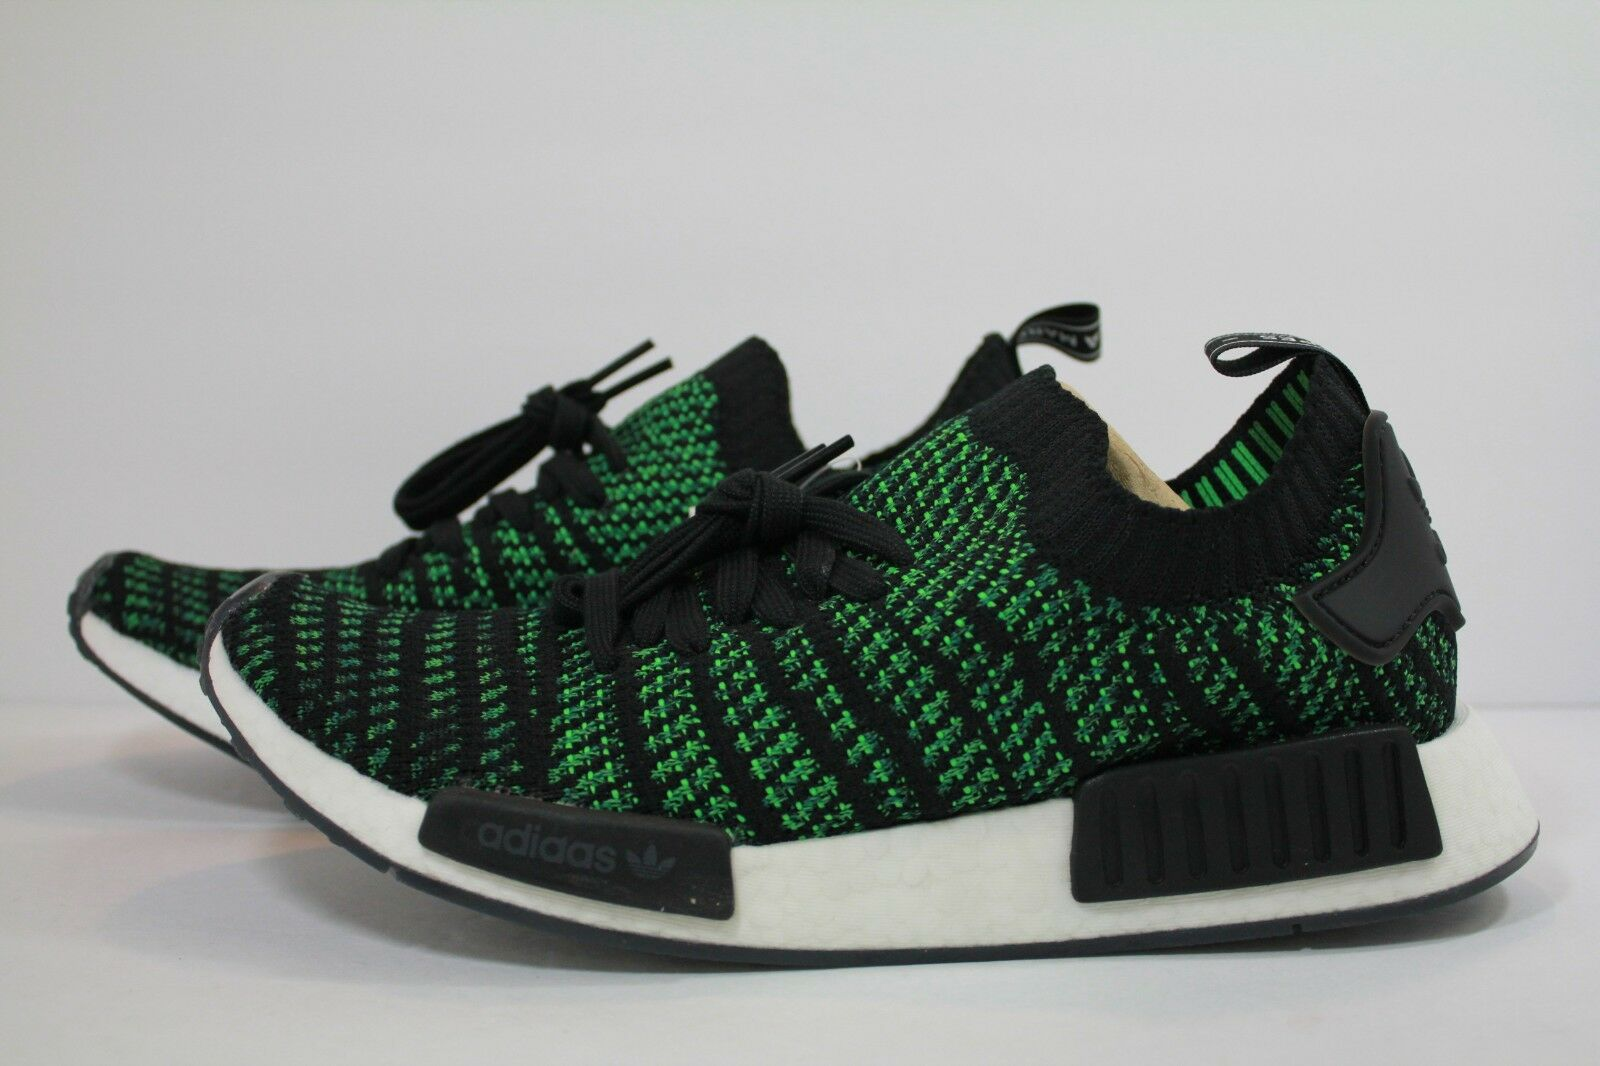 Adidas nmd_r1 stlt pk noble green / nucleo verde nero / verde nucleo audace aq0936 54a2da